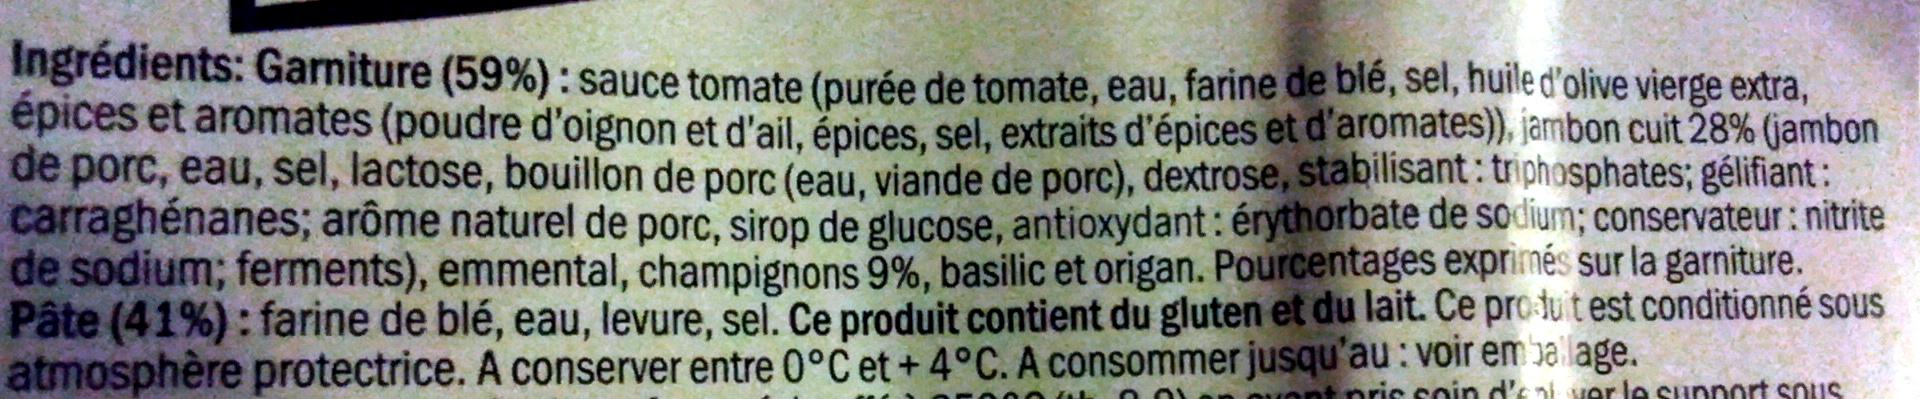 Pizza Jambon Champignons - Ingredients - fr